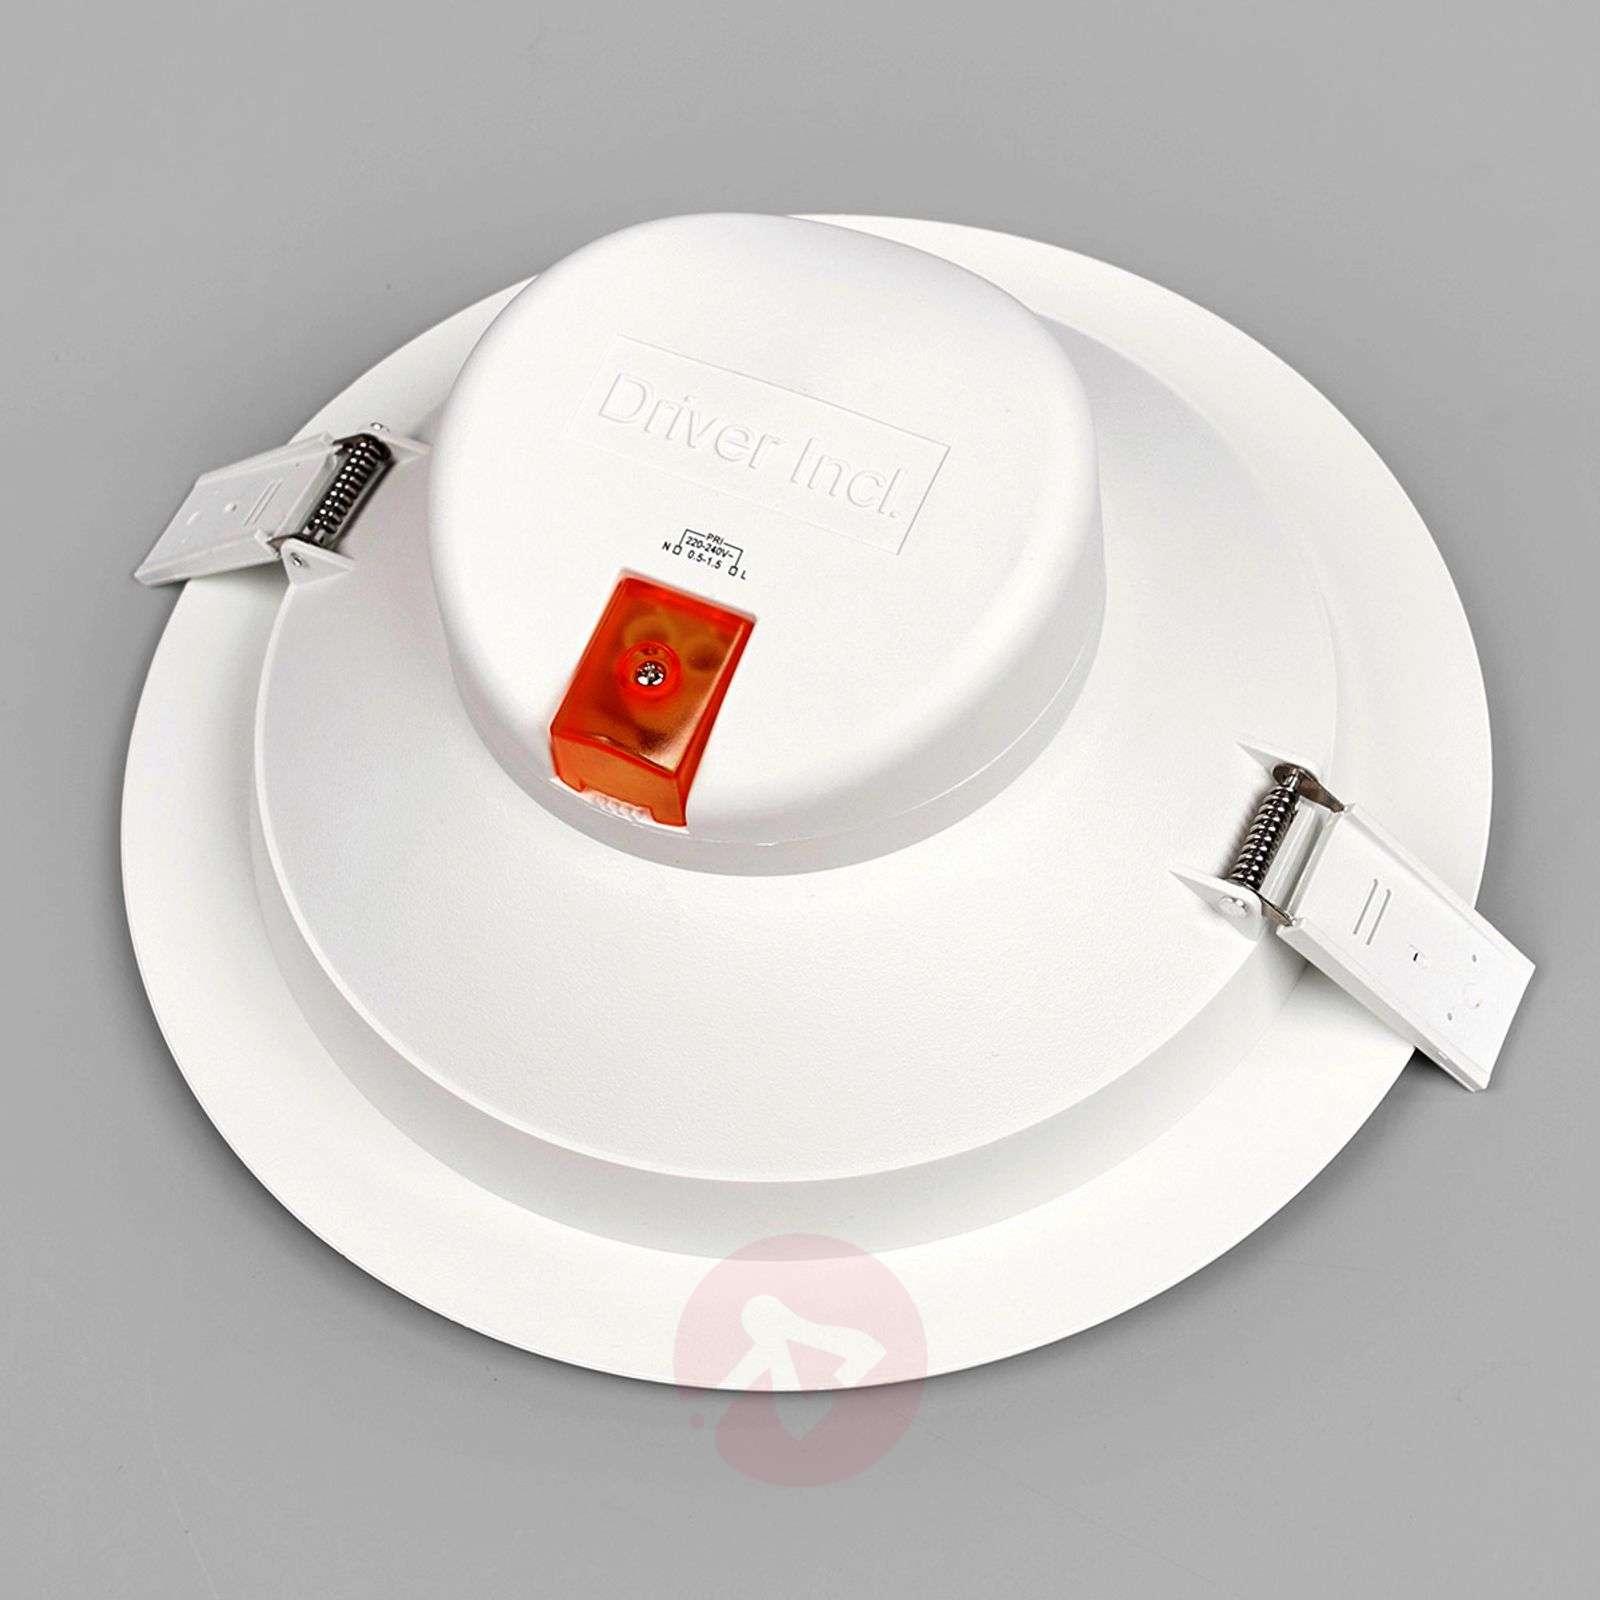 Large LED recessed spotlight Arian, 24.4 cm, 22.5W-9978012-04